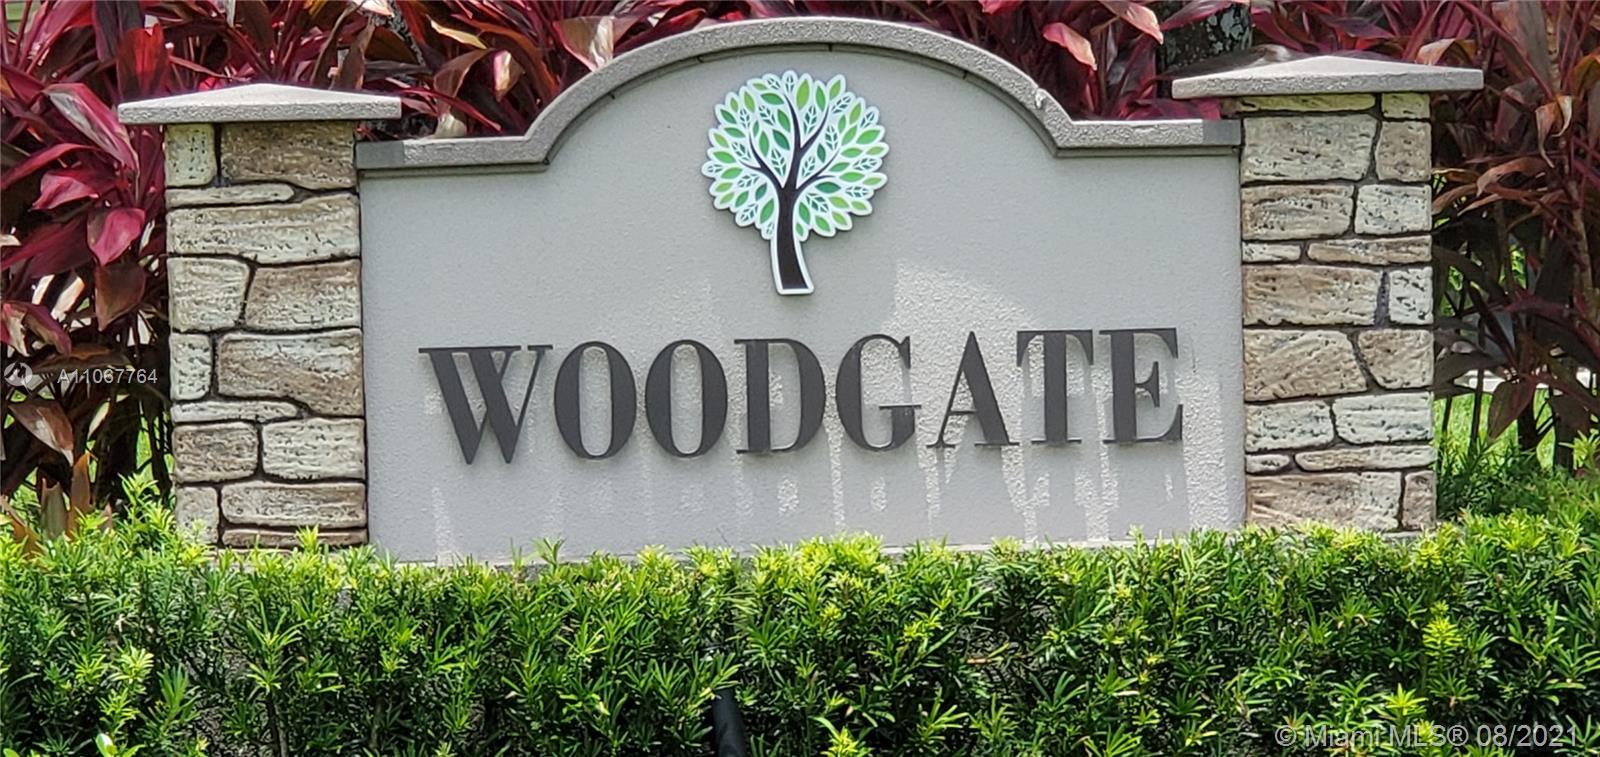 New River Estates #A - 631 Woodgate Cir #A, Sunrise, FL 33326